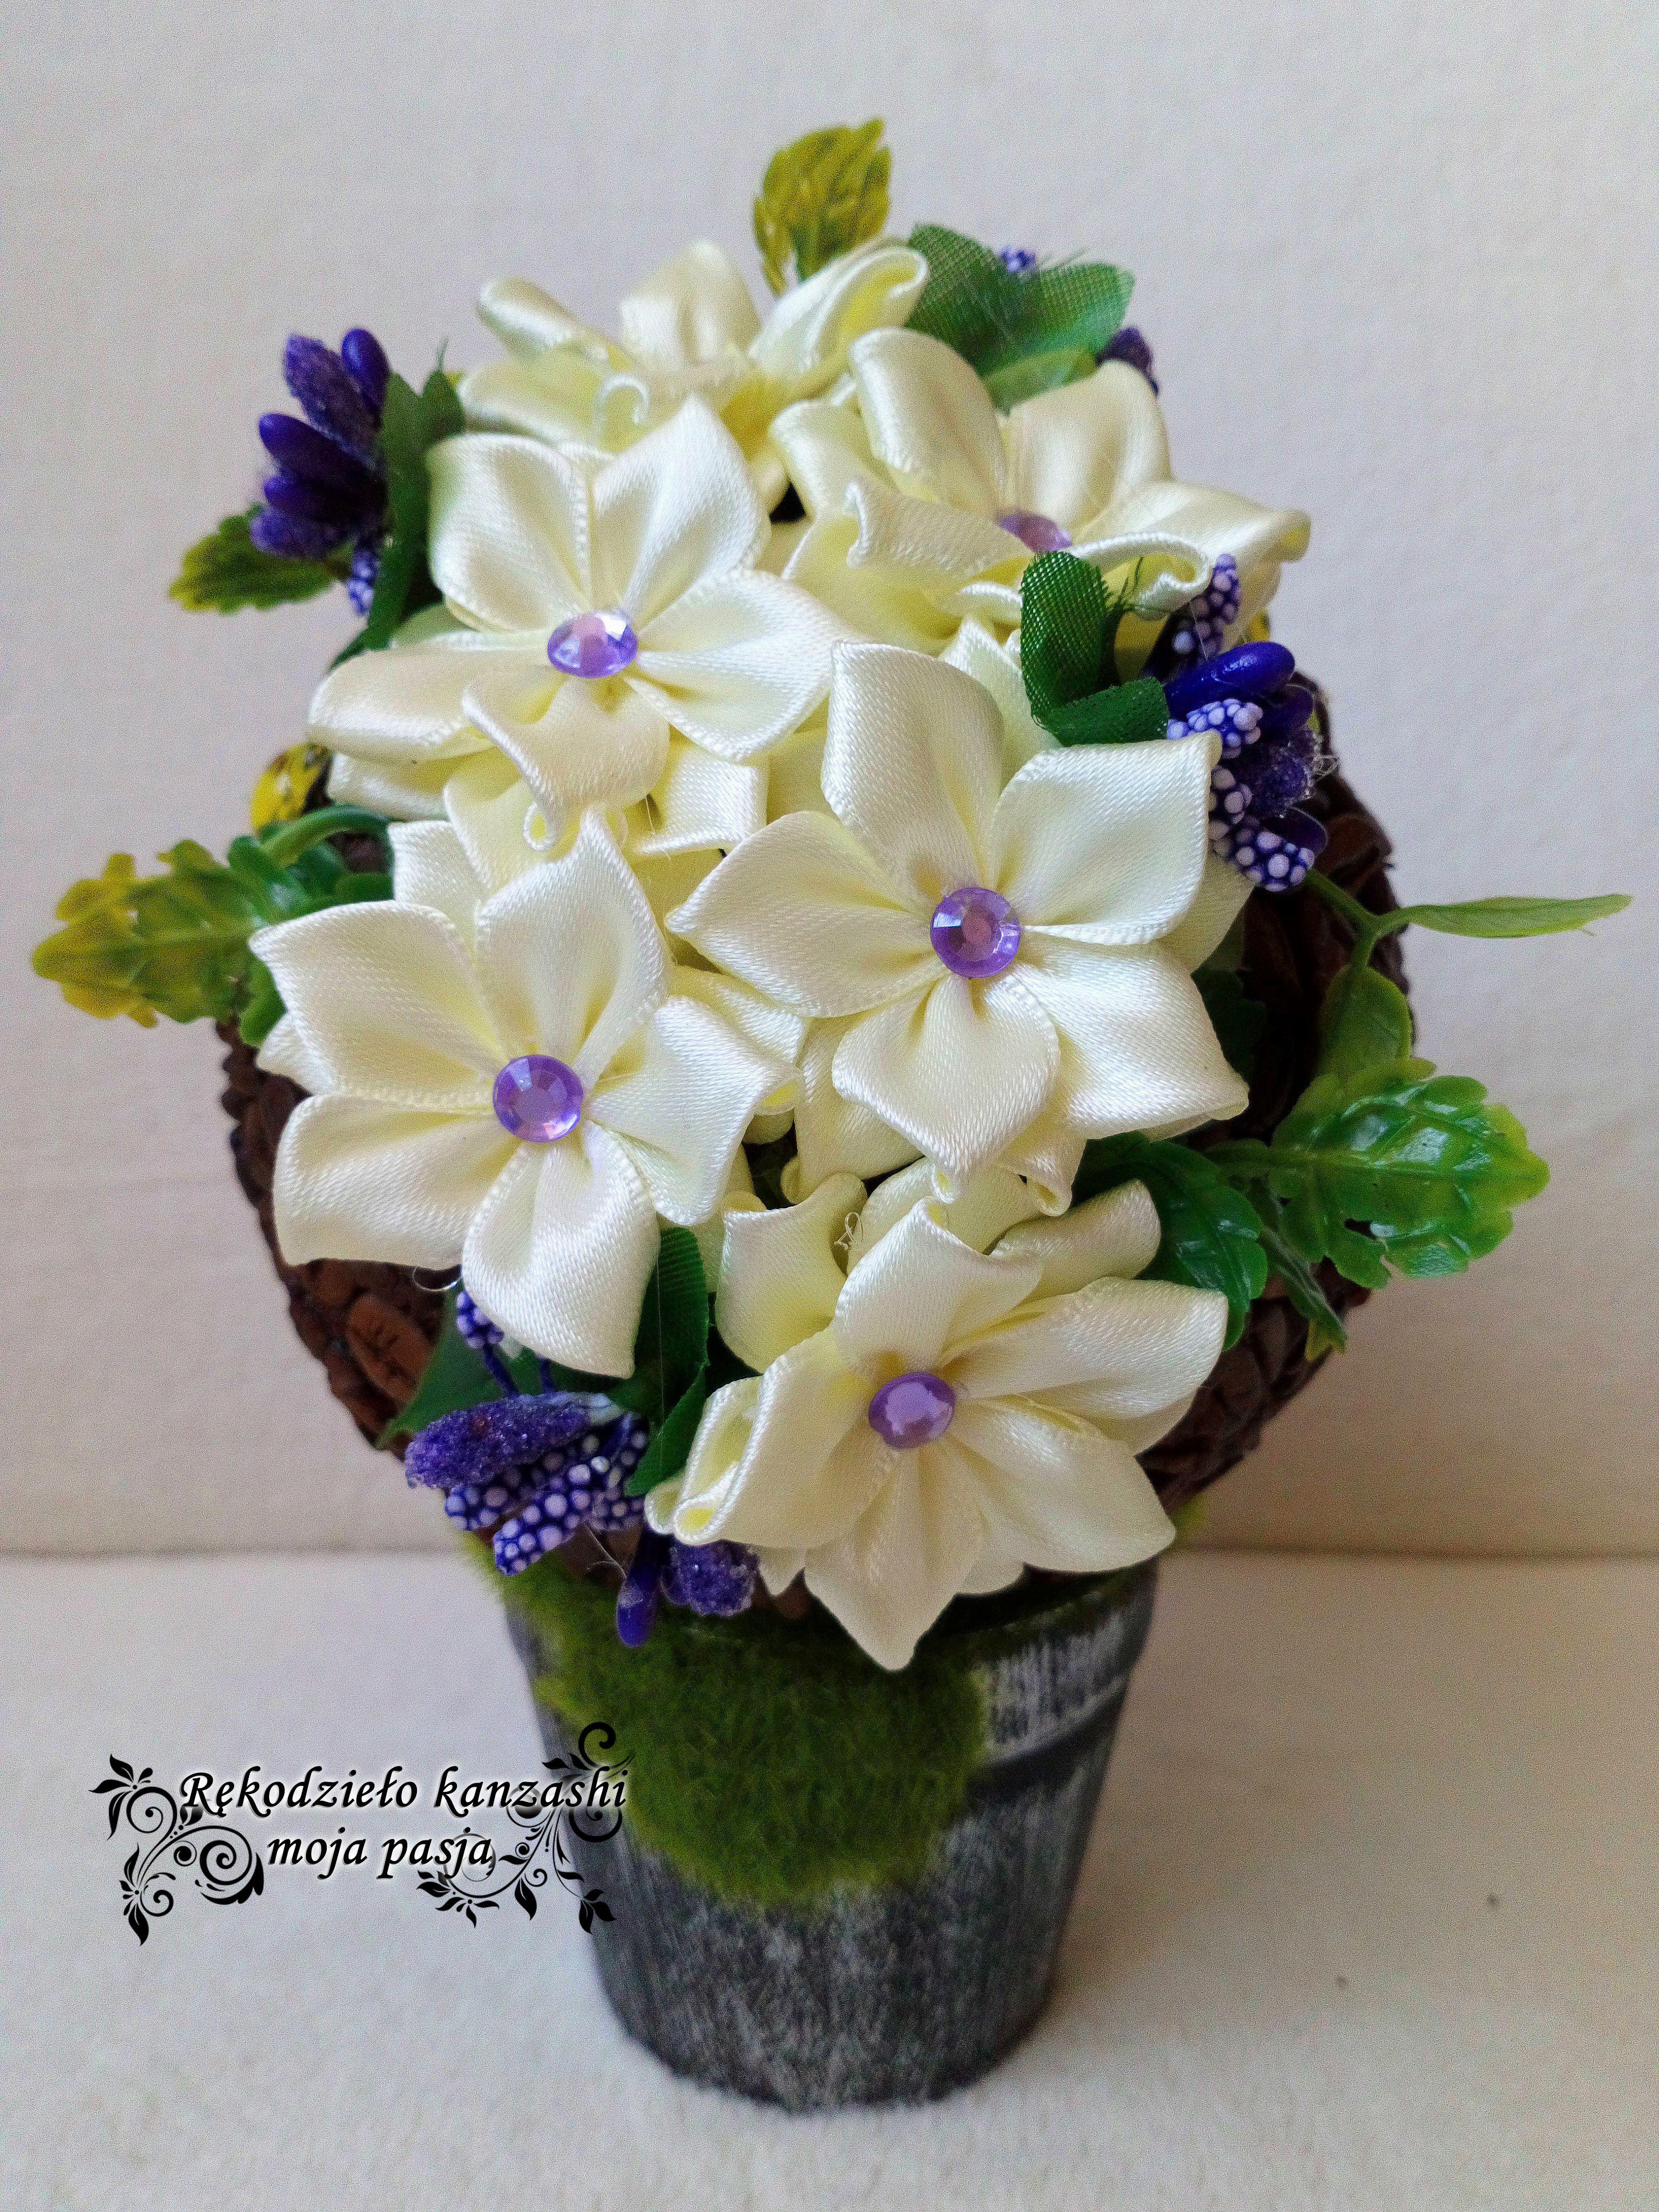 Flower Box Kawowy Na Doniczce Home Decor Decor Vase